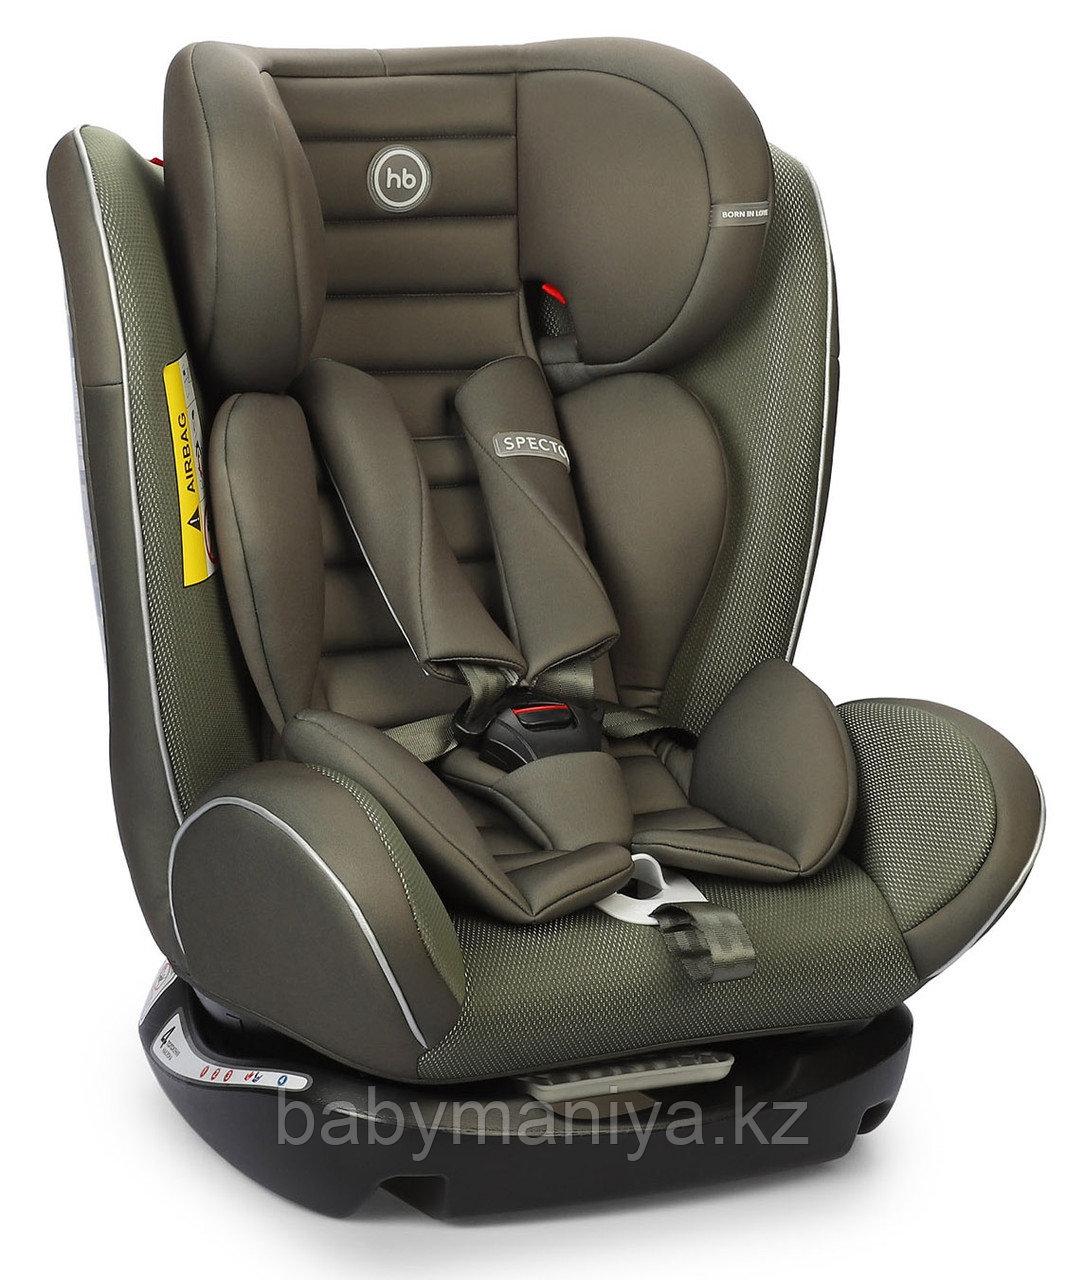 Автокресло Happy Baby 0-36 кг Spector Dark Green